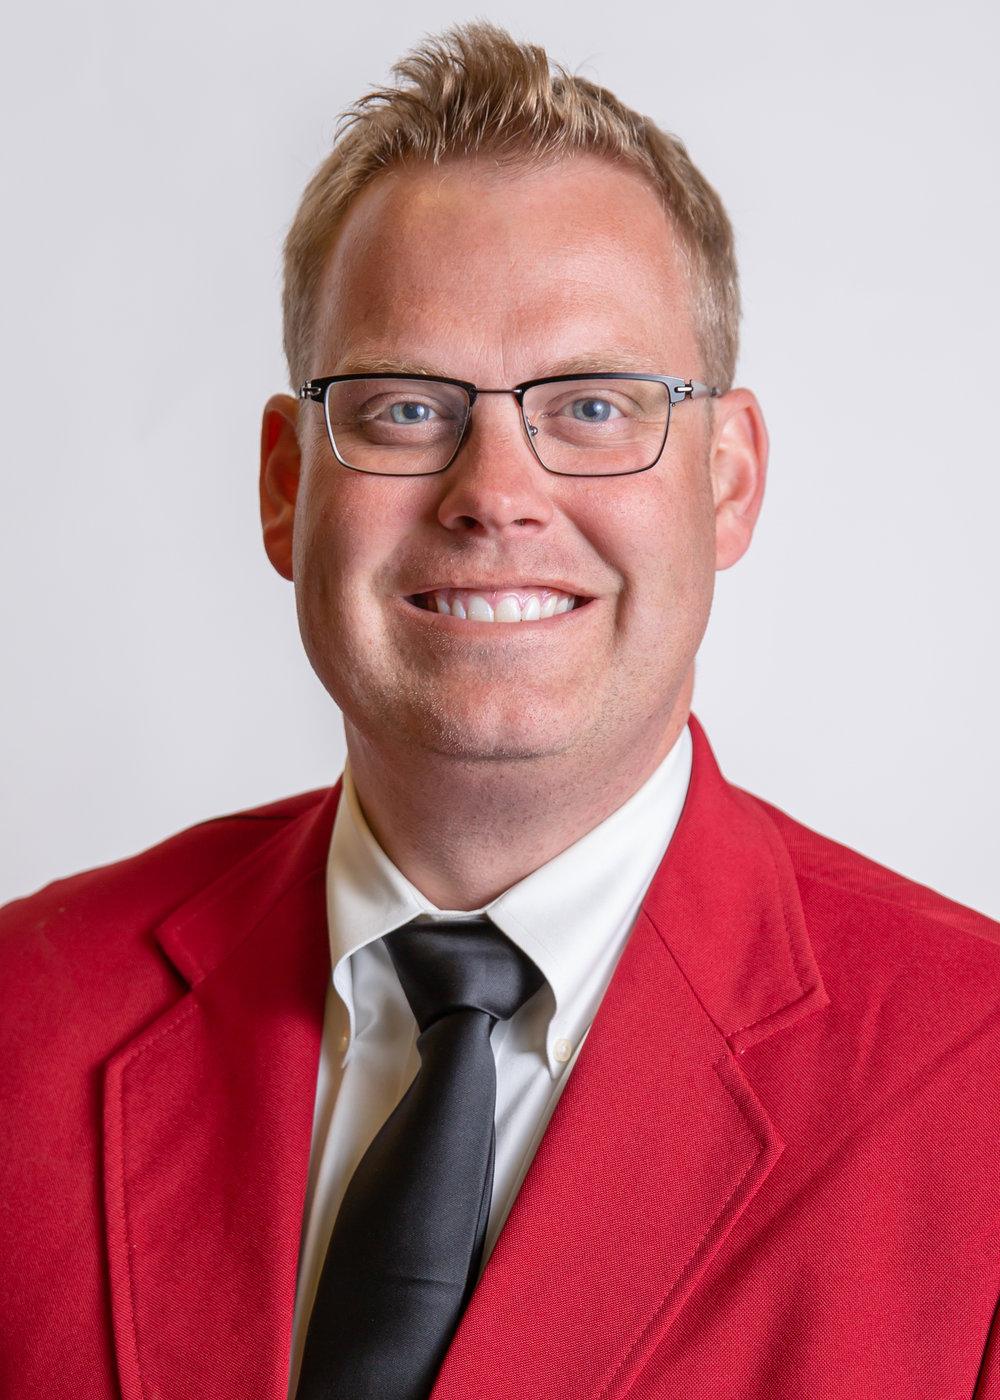 Ryan Ramsey | Director of Lighting On staff since 2011